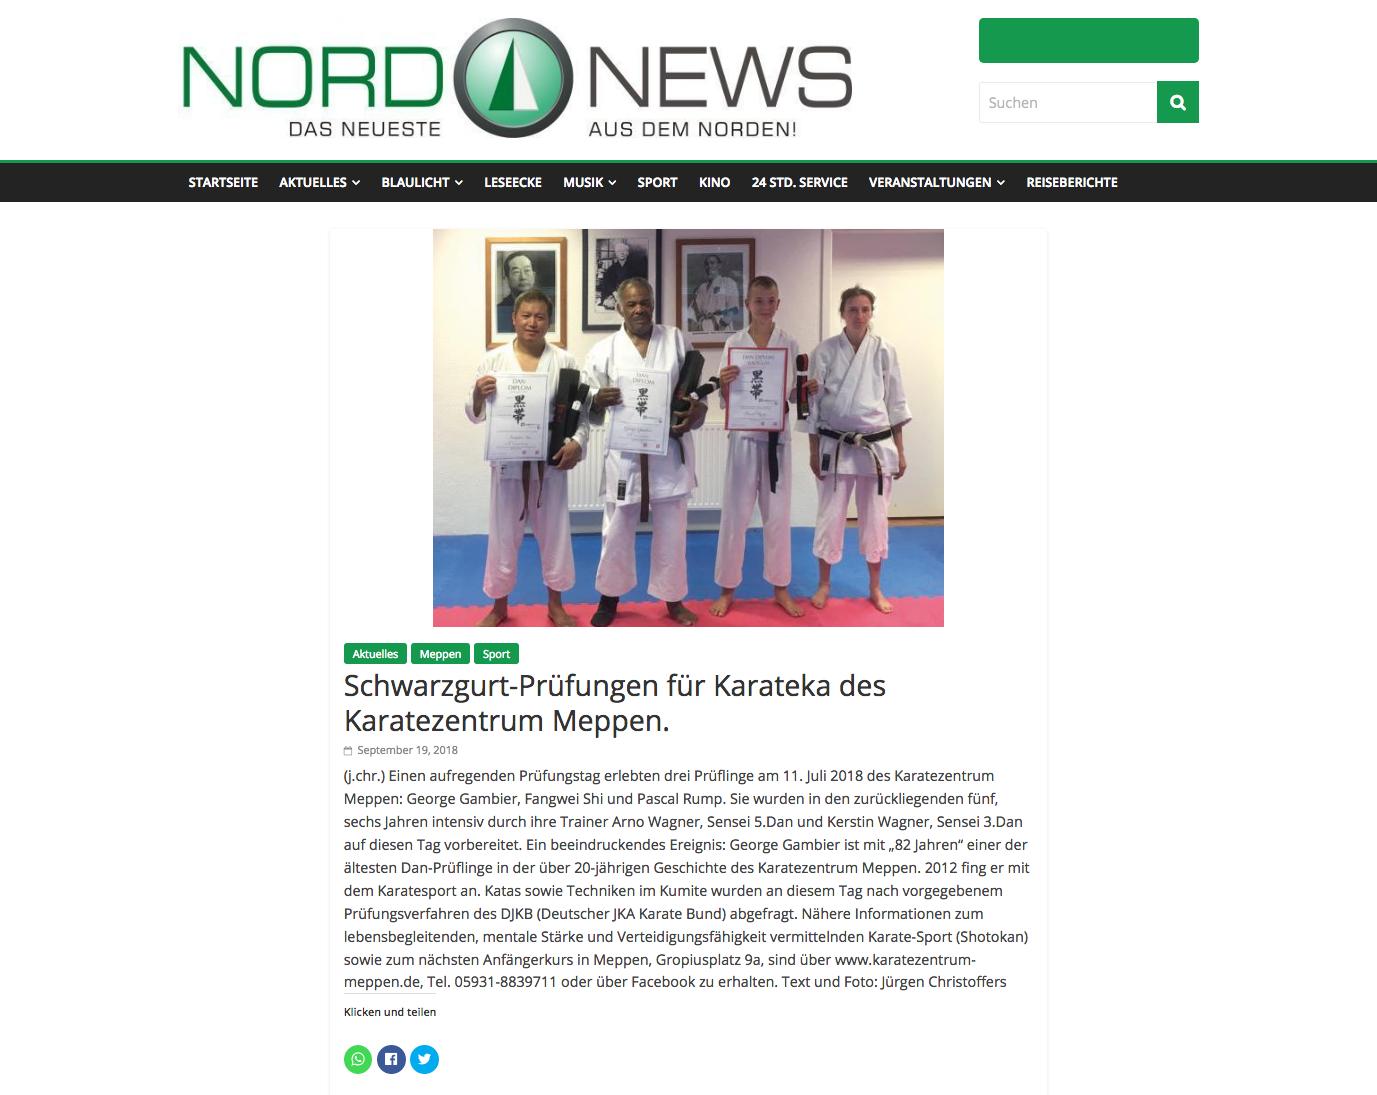 Danprüfungen Meppen 11.07.2018, NordNews-Online am 19.09.2018